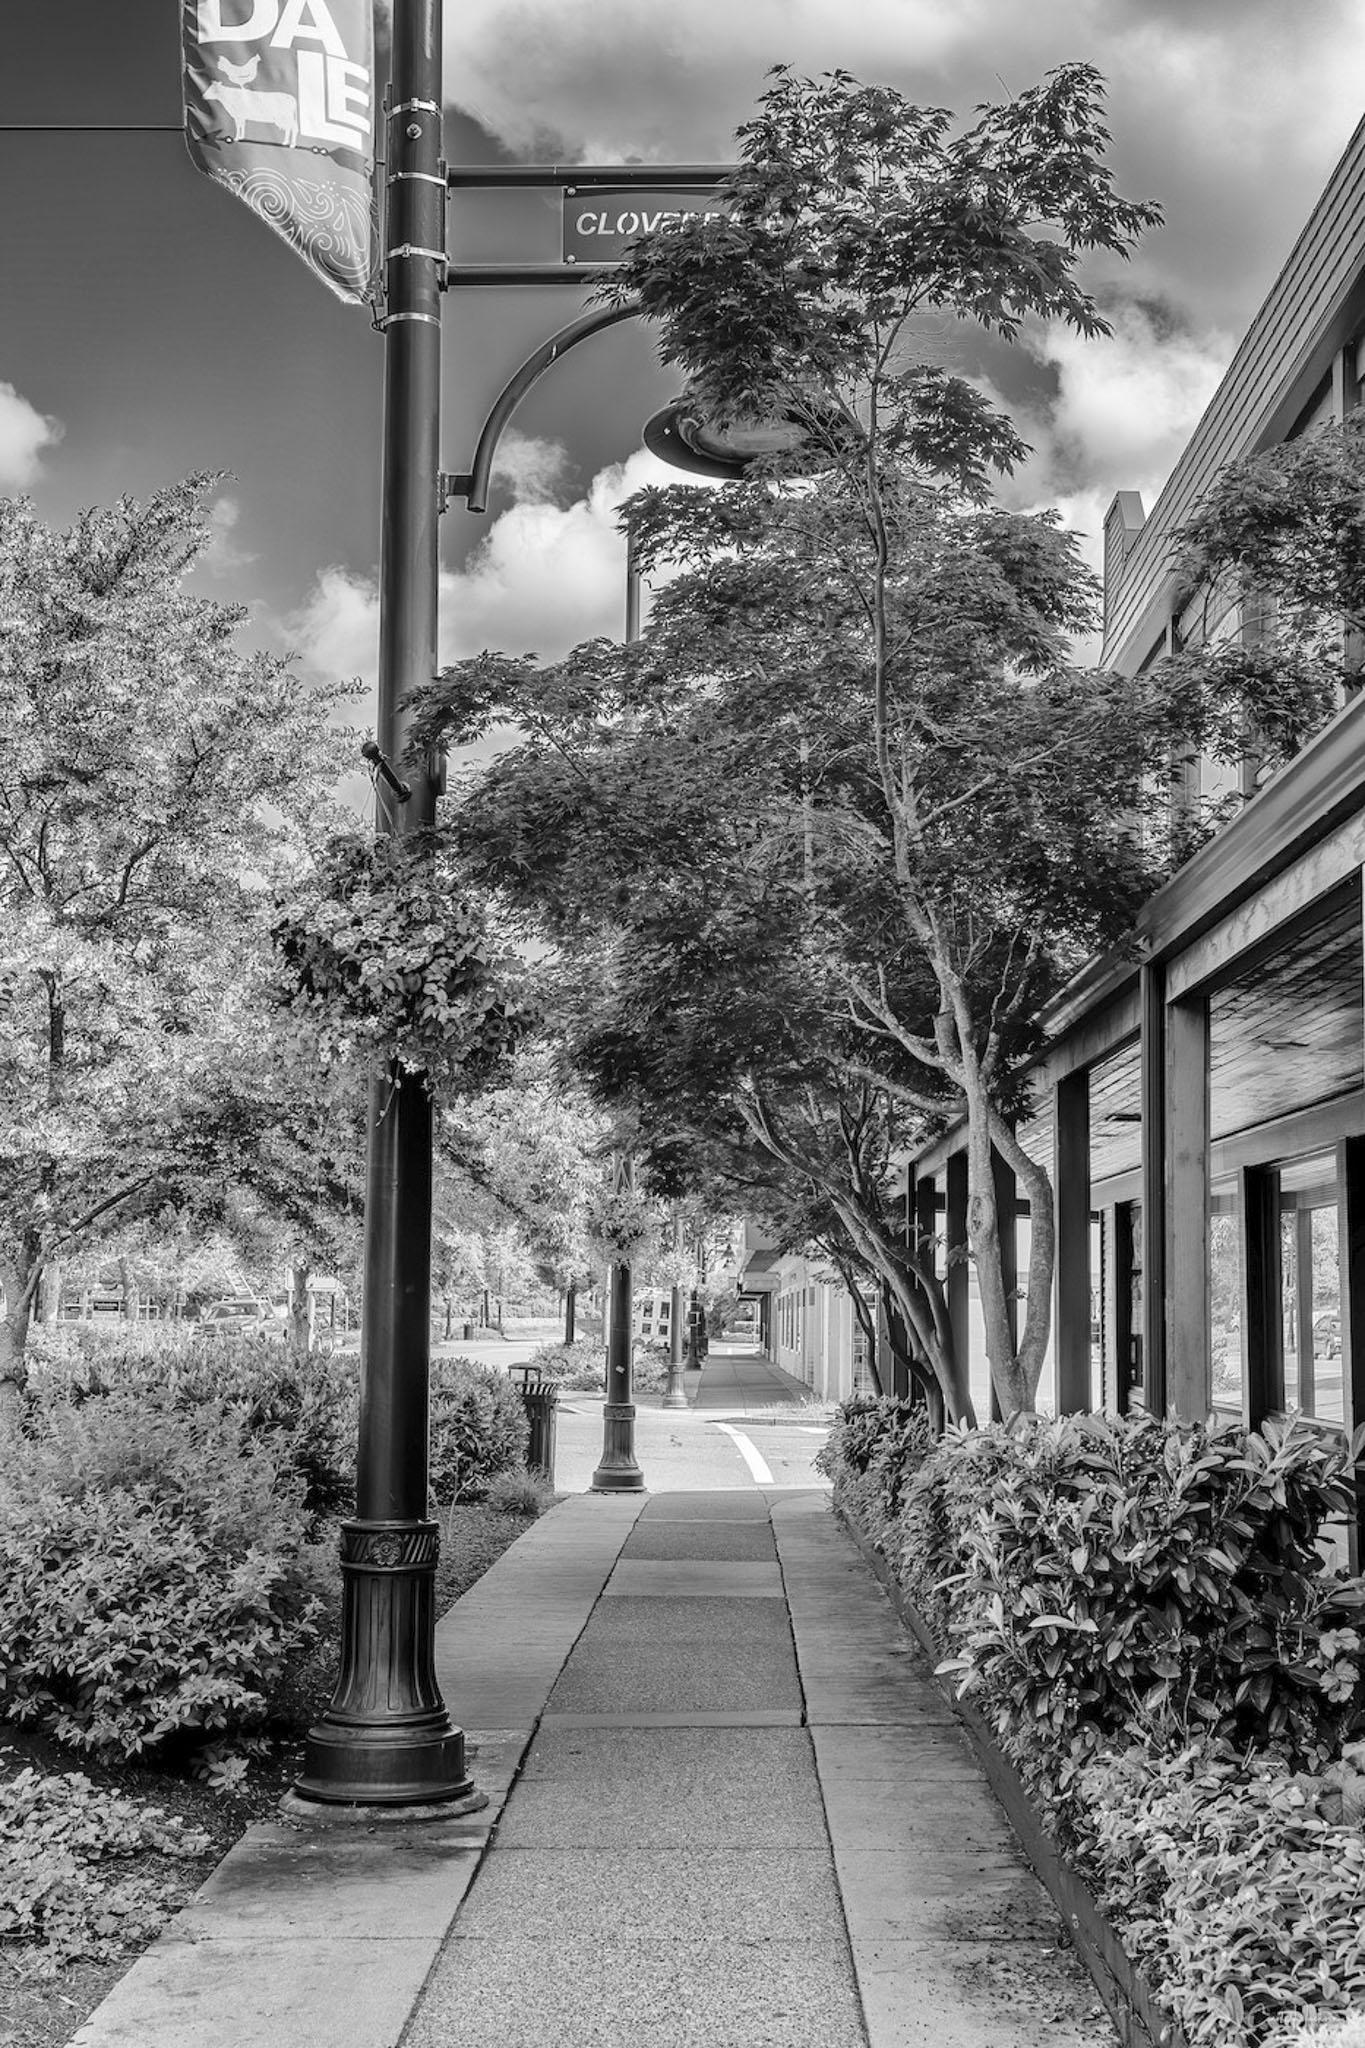 Cloverdale Street in BW - Carol Jackson